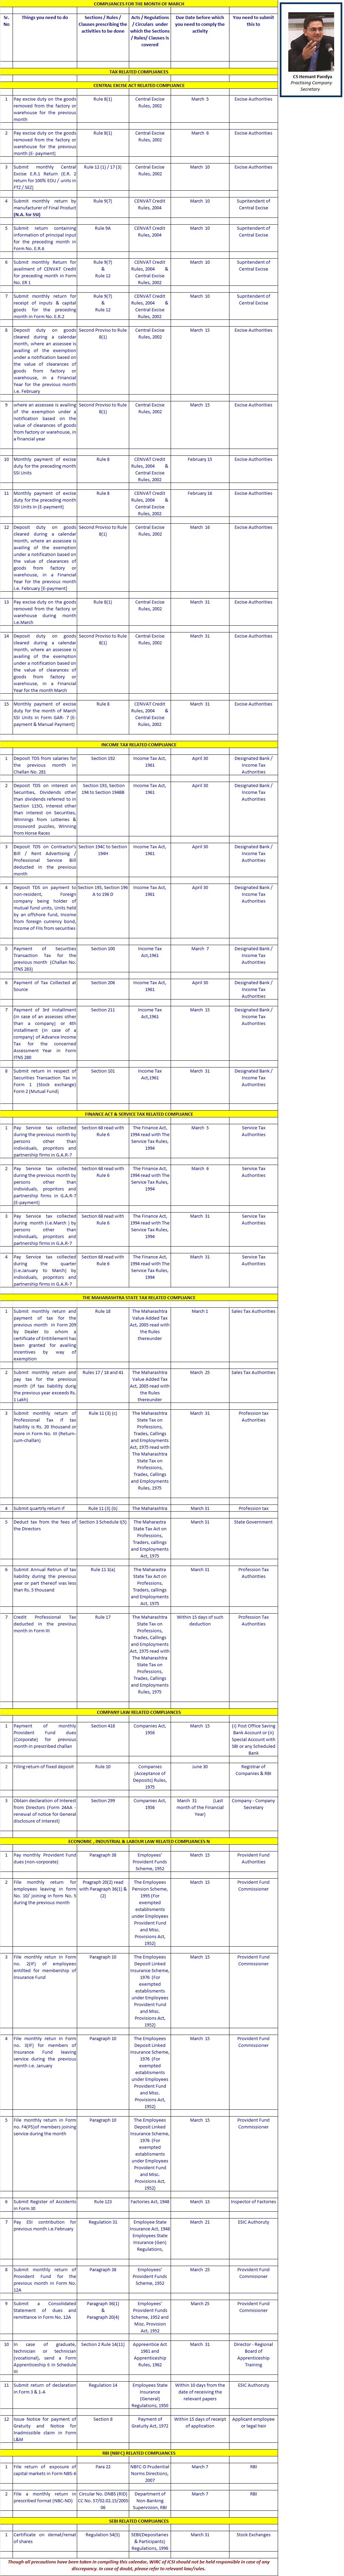 ICSI-WIRC • Focus Feb 2014 • Digital Newsletter